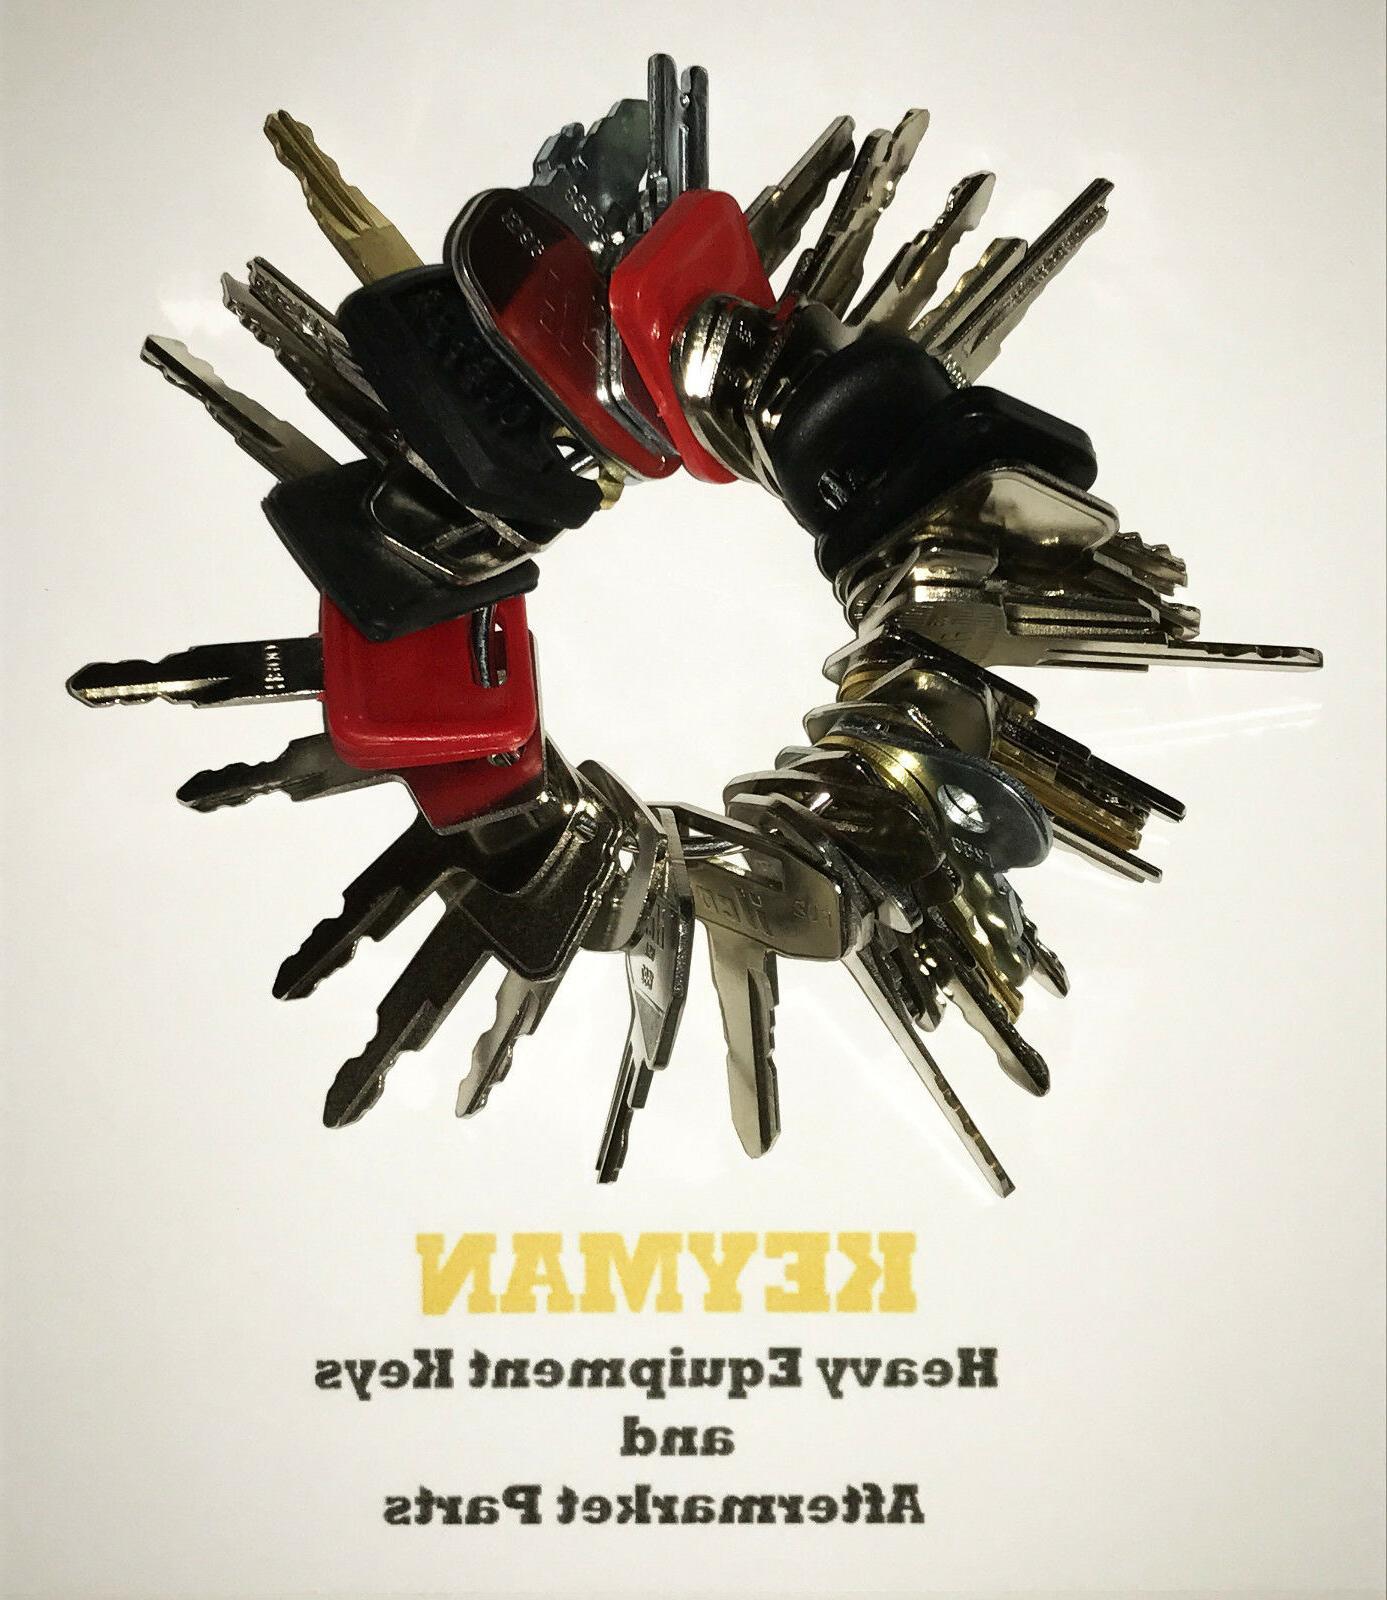 Operator Equipment Key Set / 35 Construction Ignition Keys C